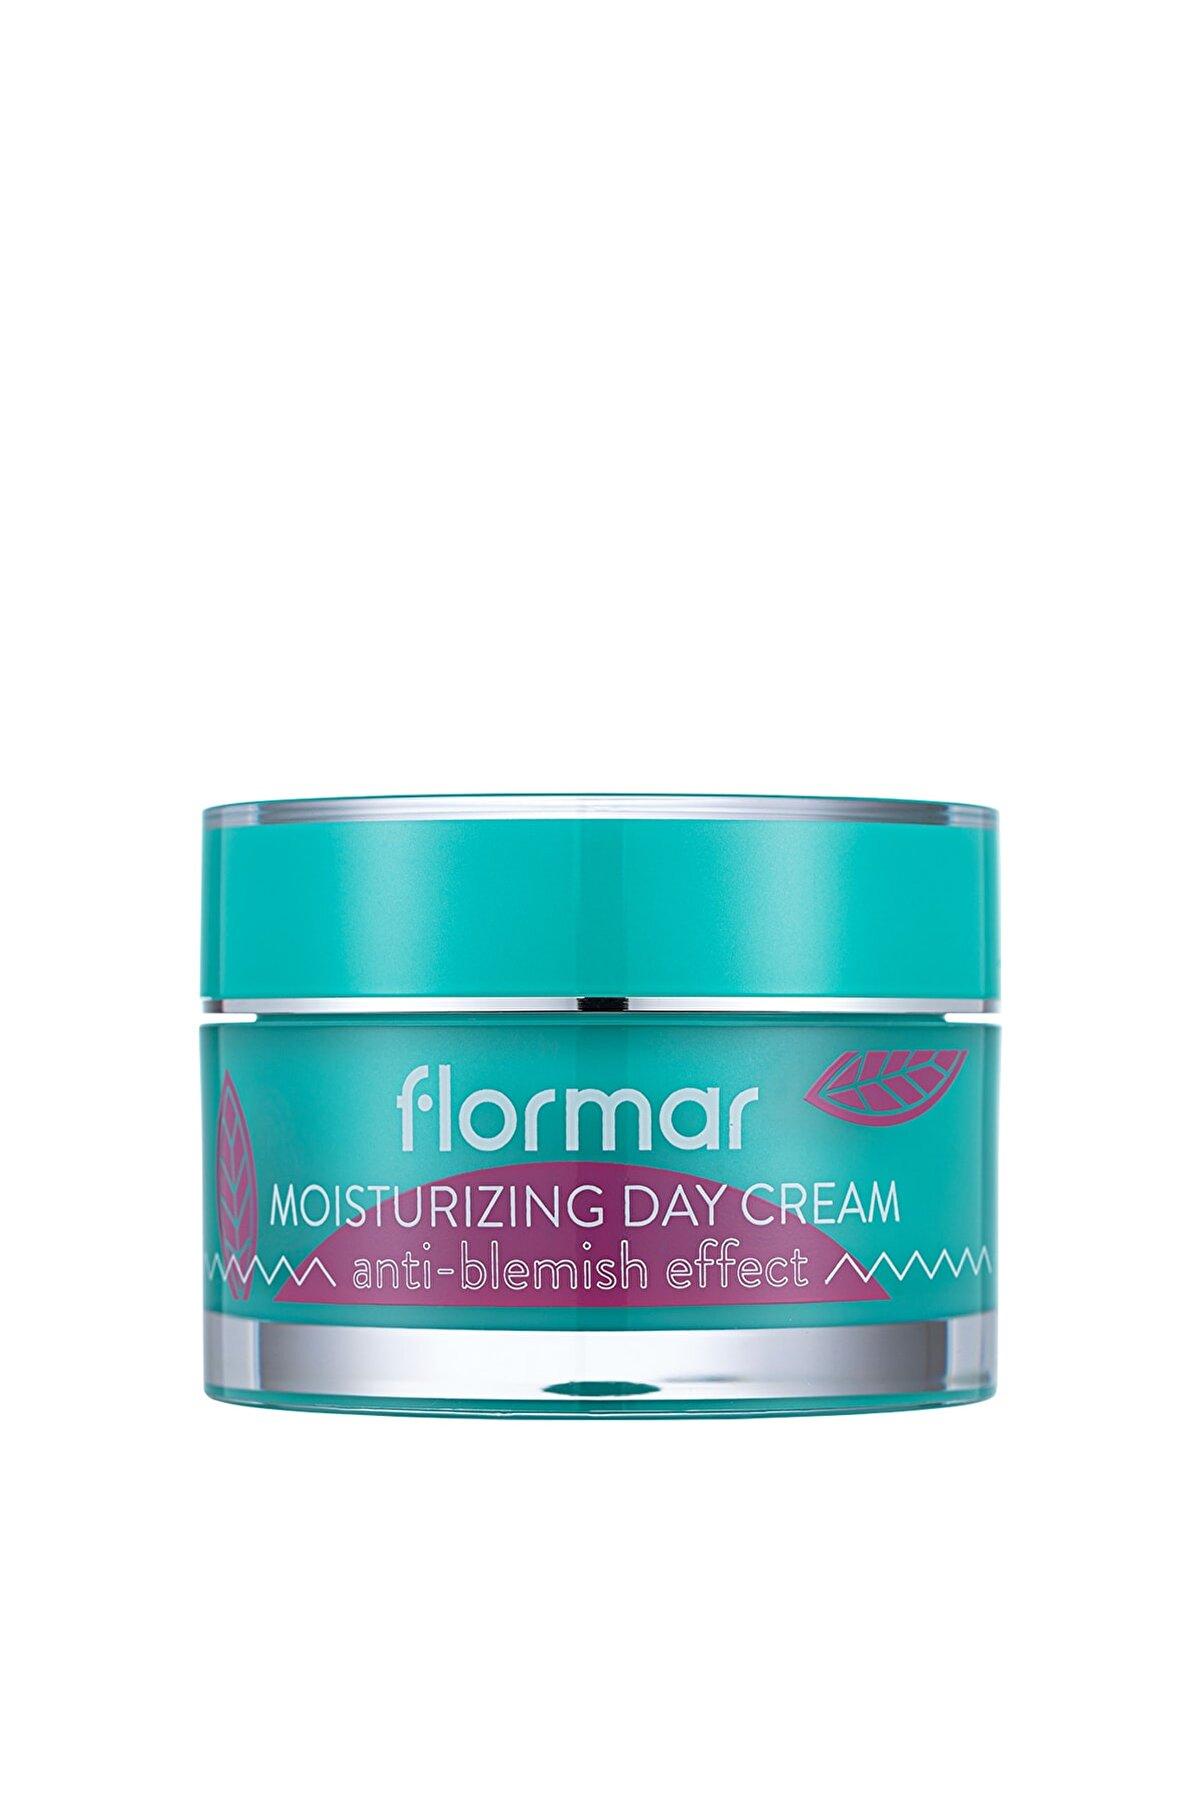 Flormar Nemlendirici Krem - Moisturizing Day Cream 003 8690604557196